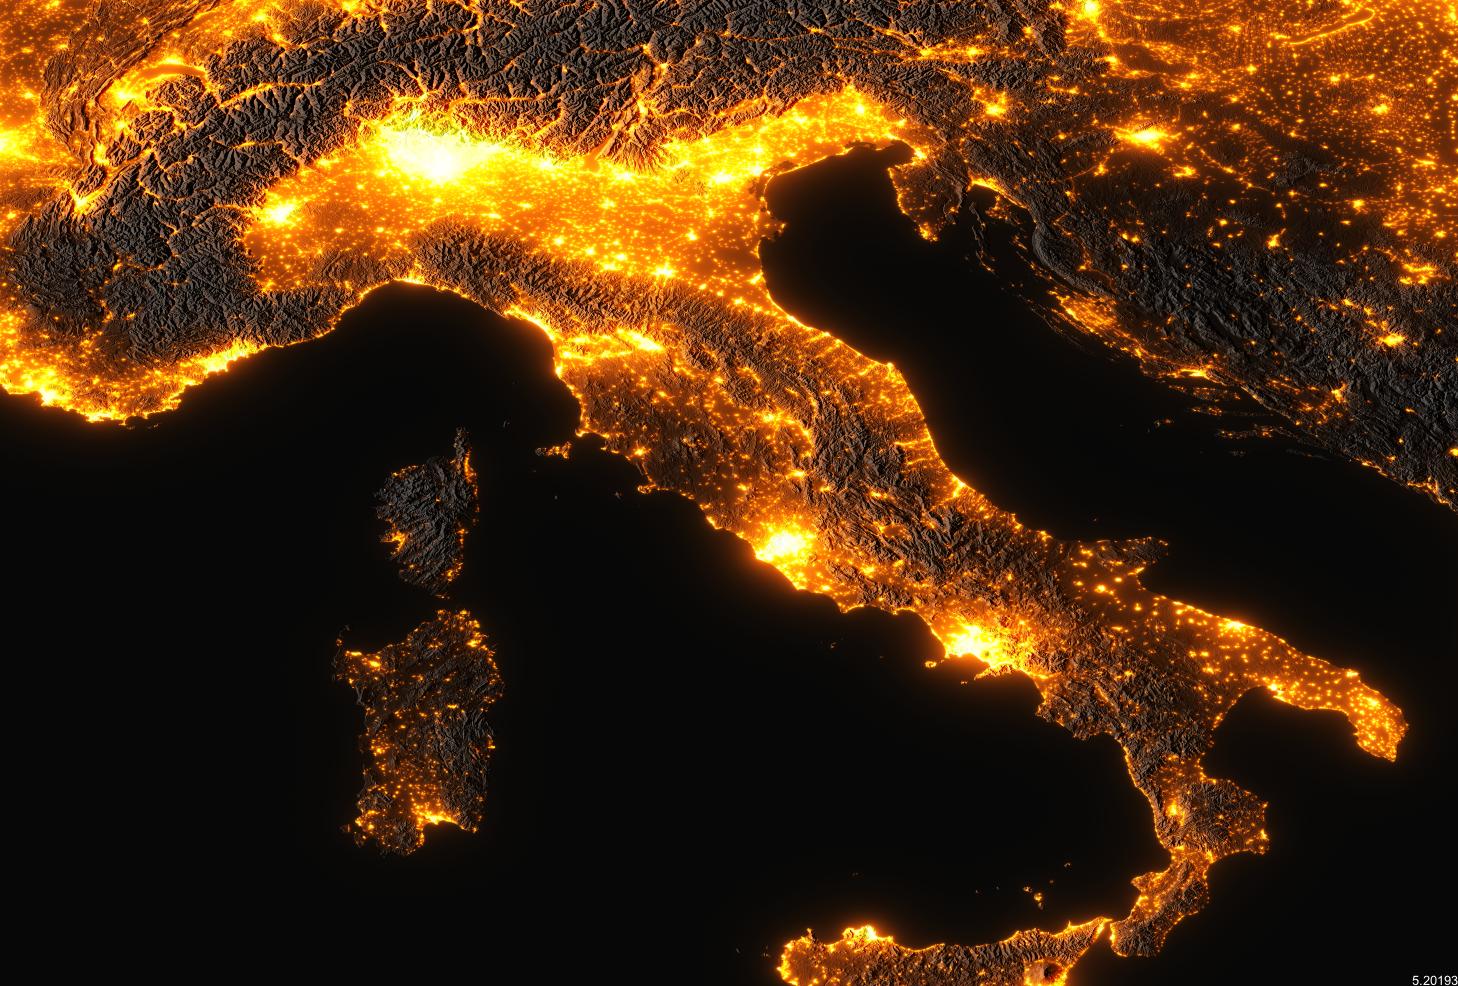 italia-notte-inquinamento-luminoso.png